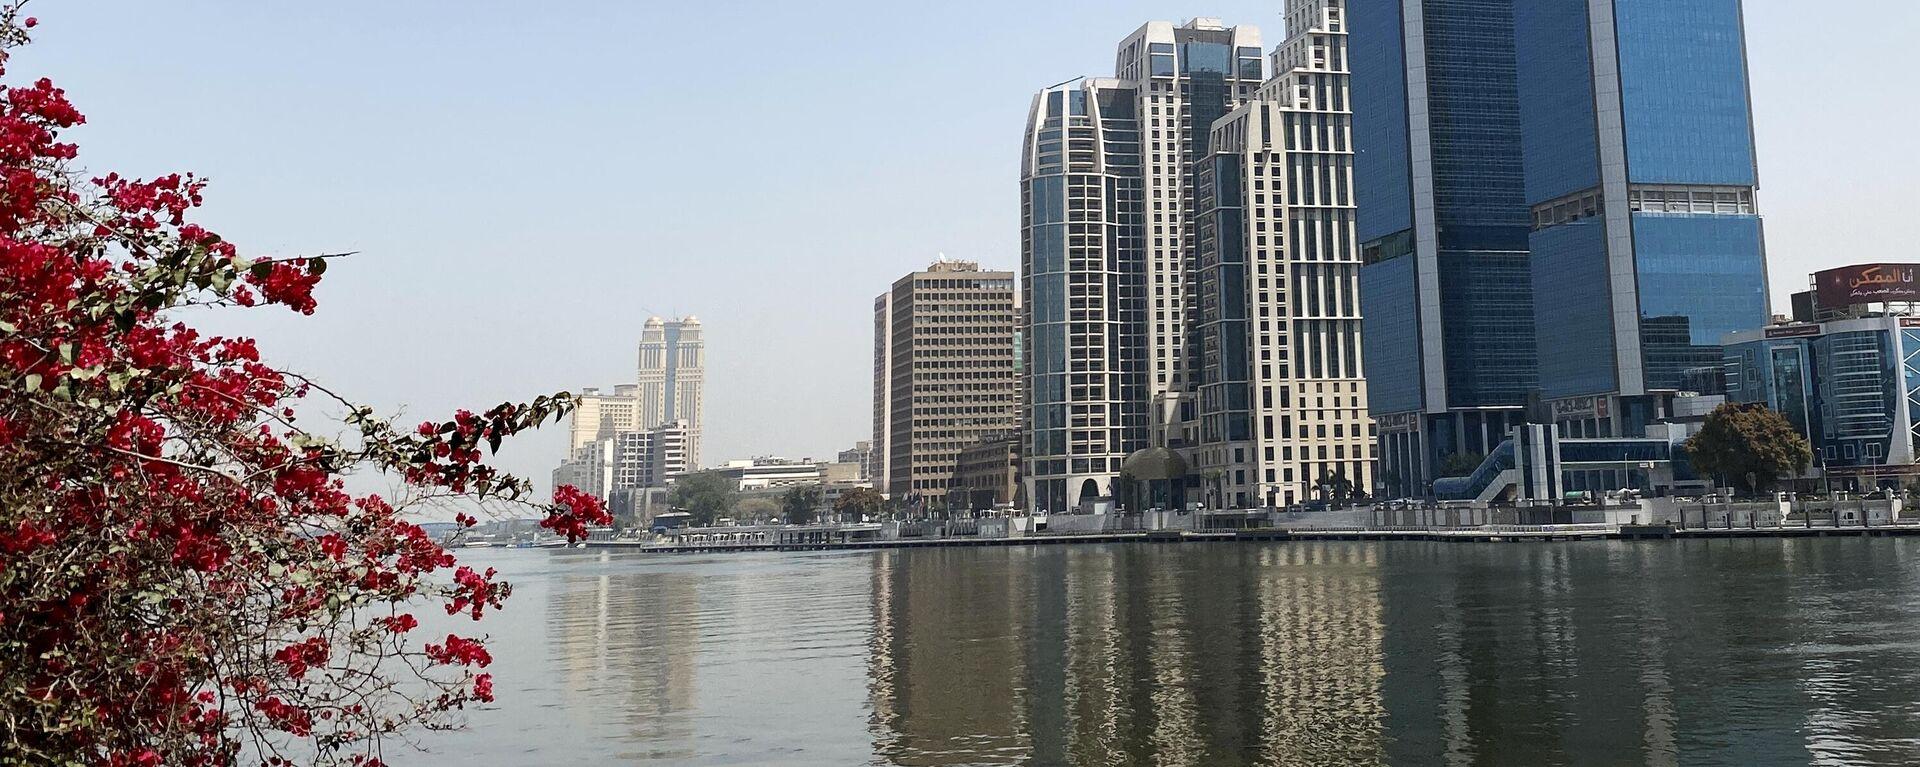 Il Nilo al Cairo - Sputnik Italia, 1920, 12.06.2021